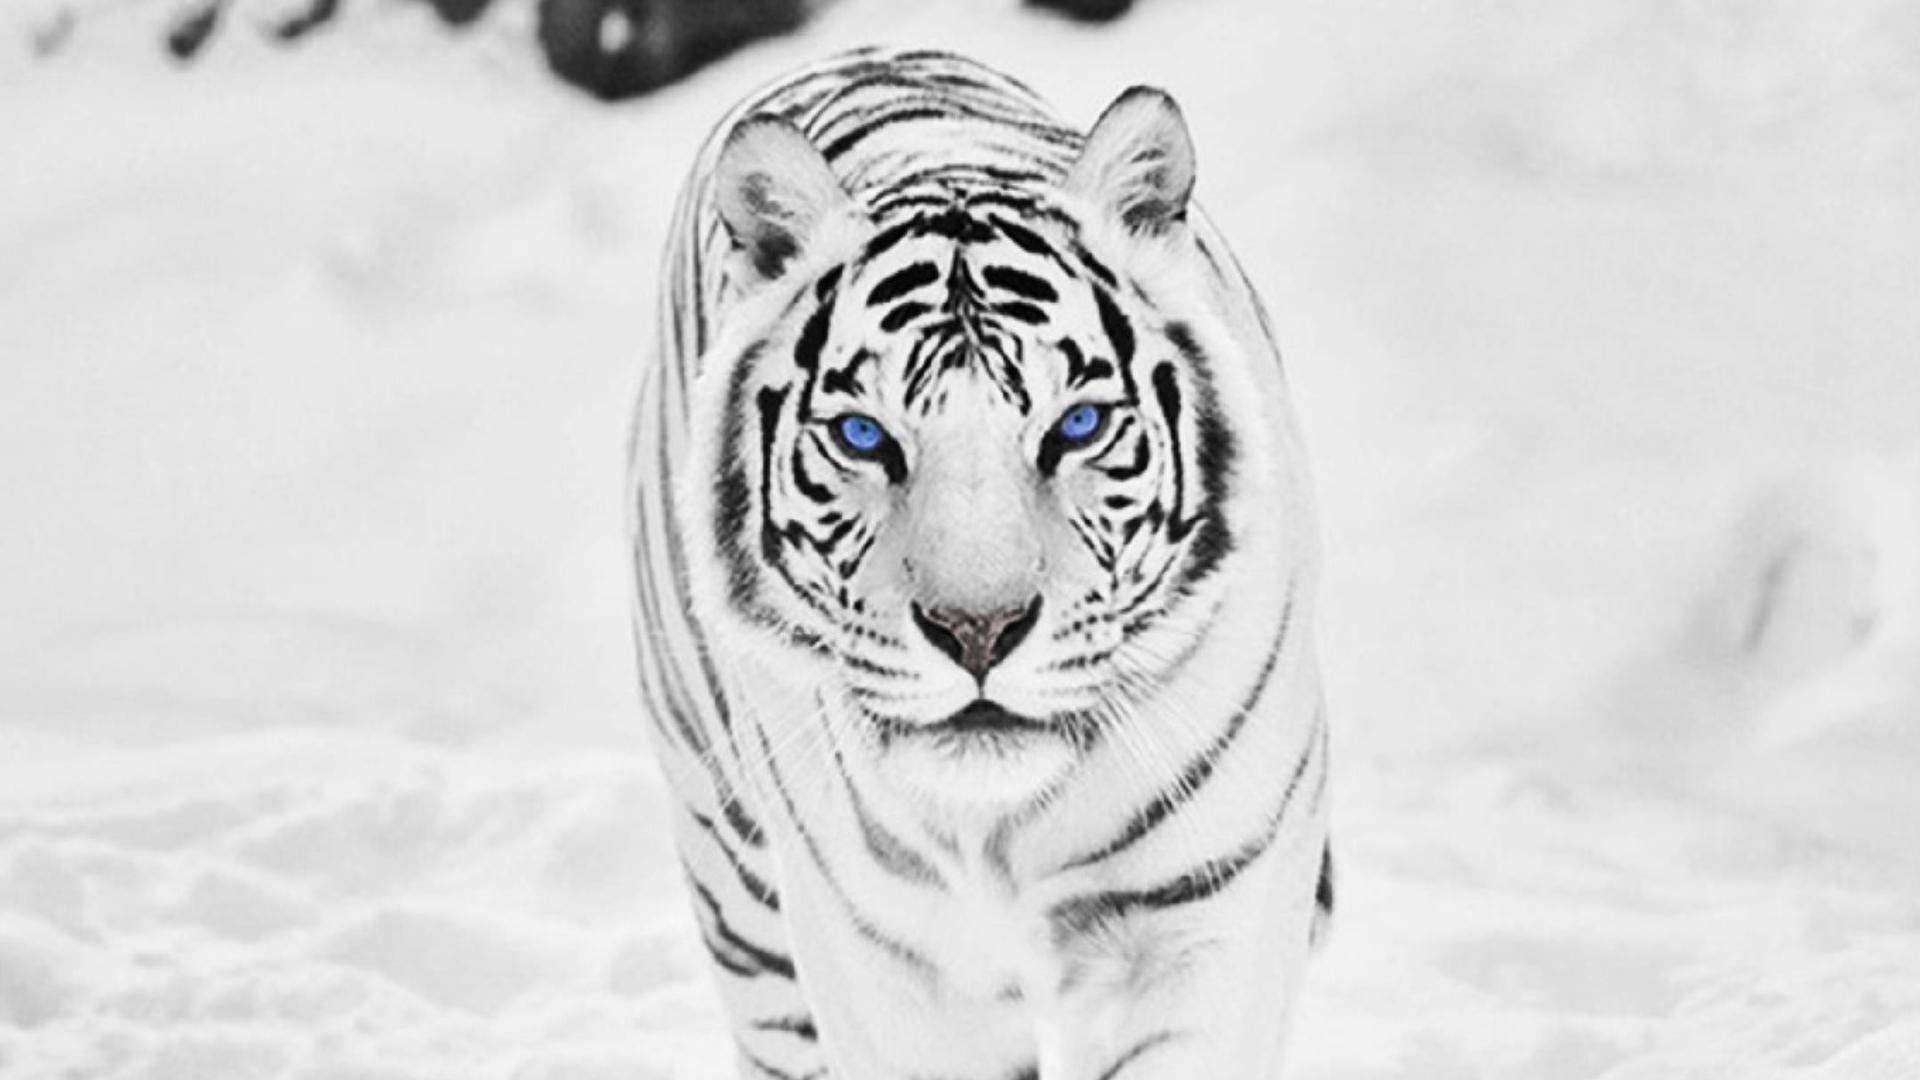 White siberian tiger wallpaper 56 images 1920x1080 siberian white tiger nexus 5 wallpaper 1920x1080 voltagebd Images